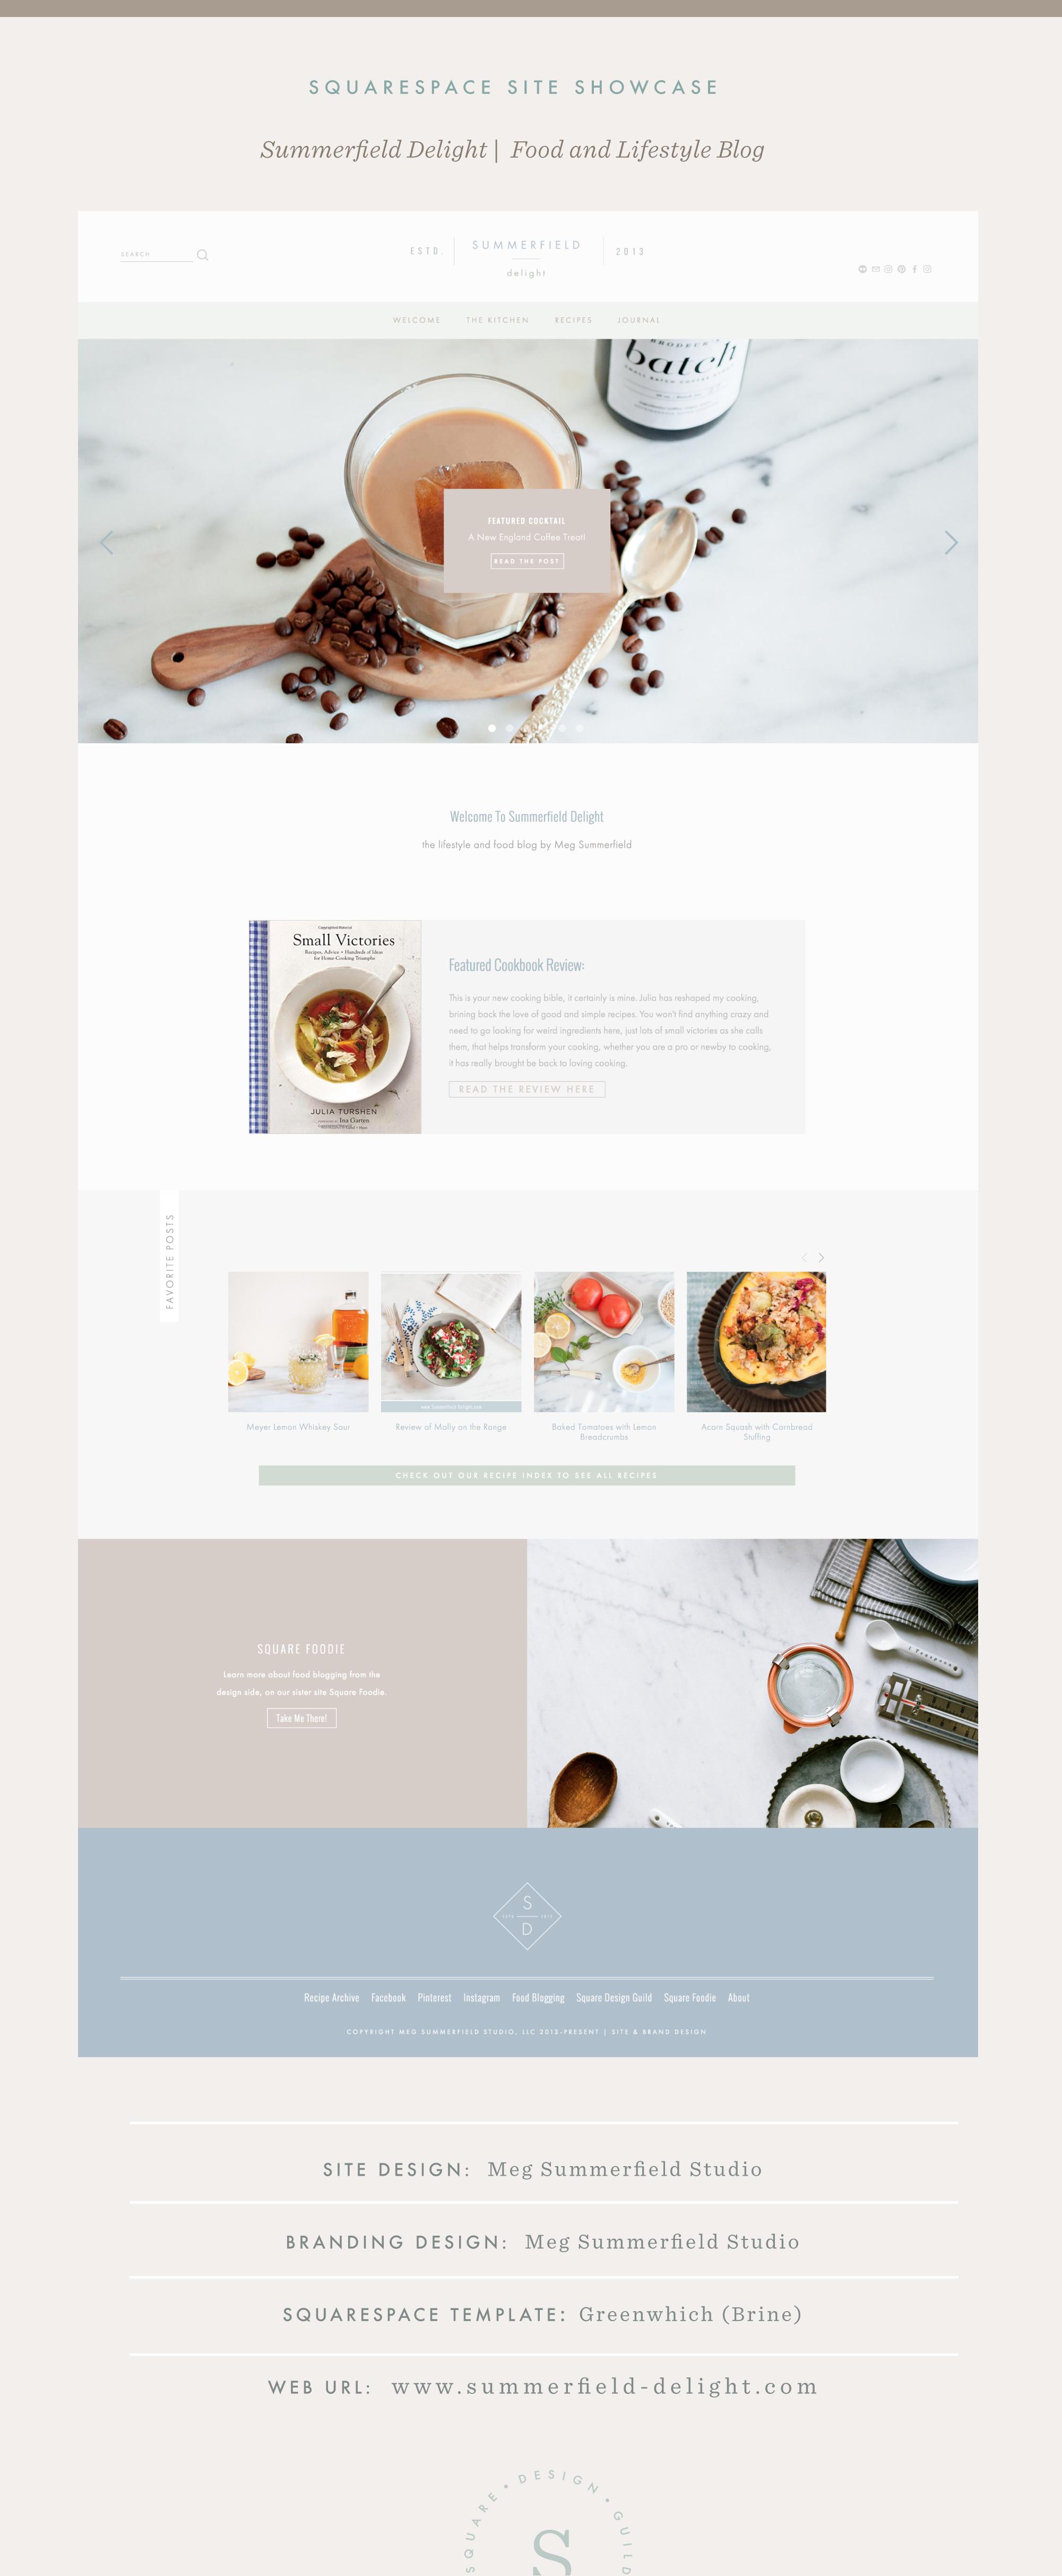 Squarespace Site Showcase   Food Blog Design   Summerfield Delight   Brine Template   Squarespace Food Blog